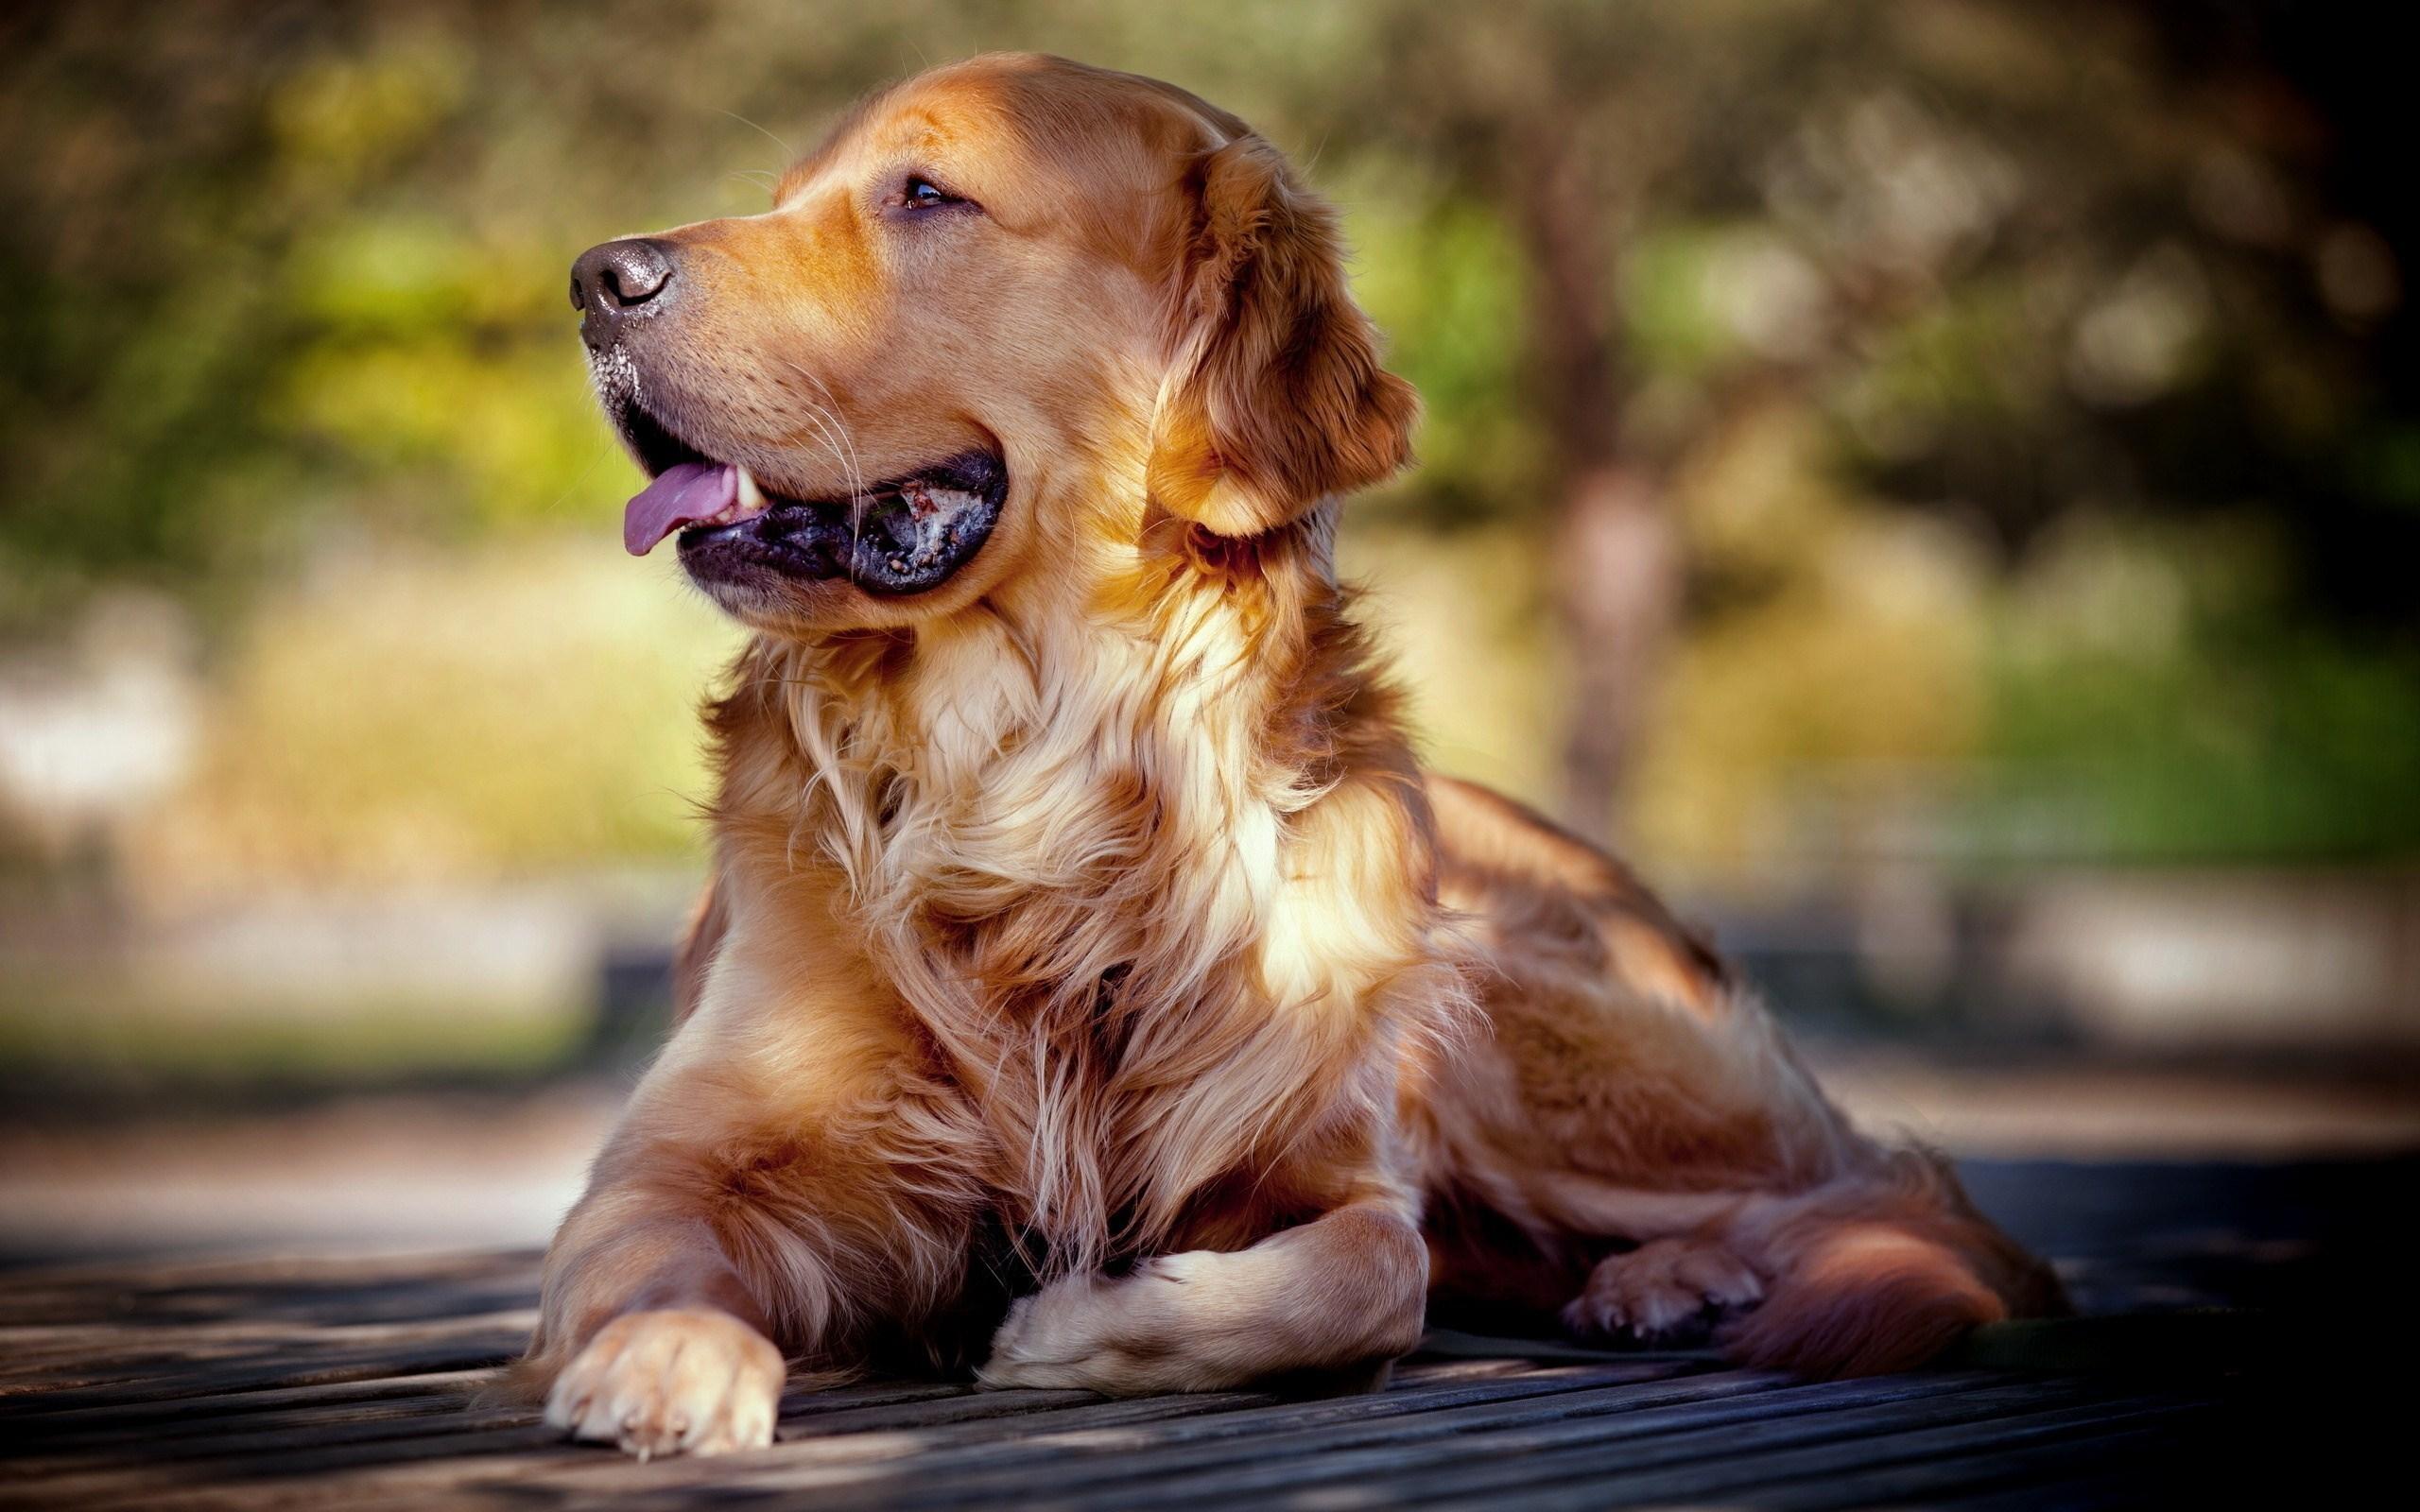 Pics Photos   Dog Desktop Wallpapers Wallpaper To 2560x1600